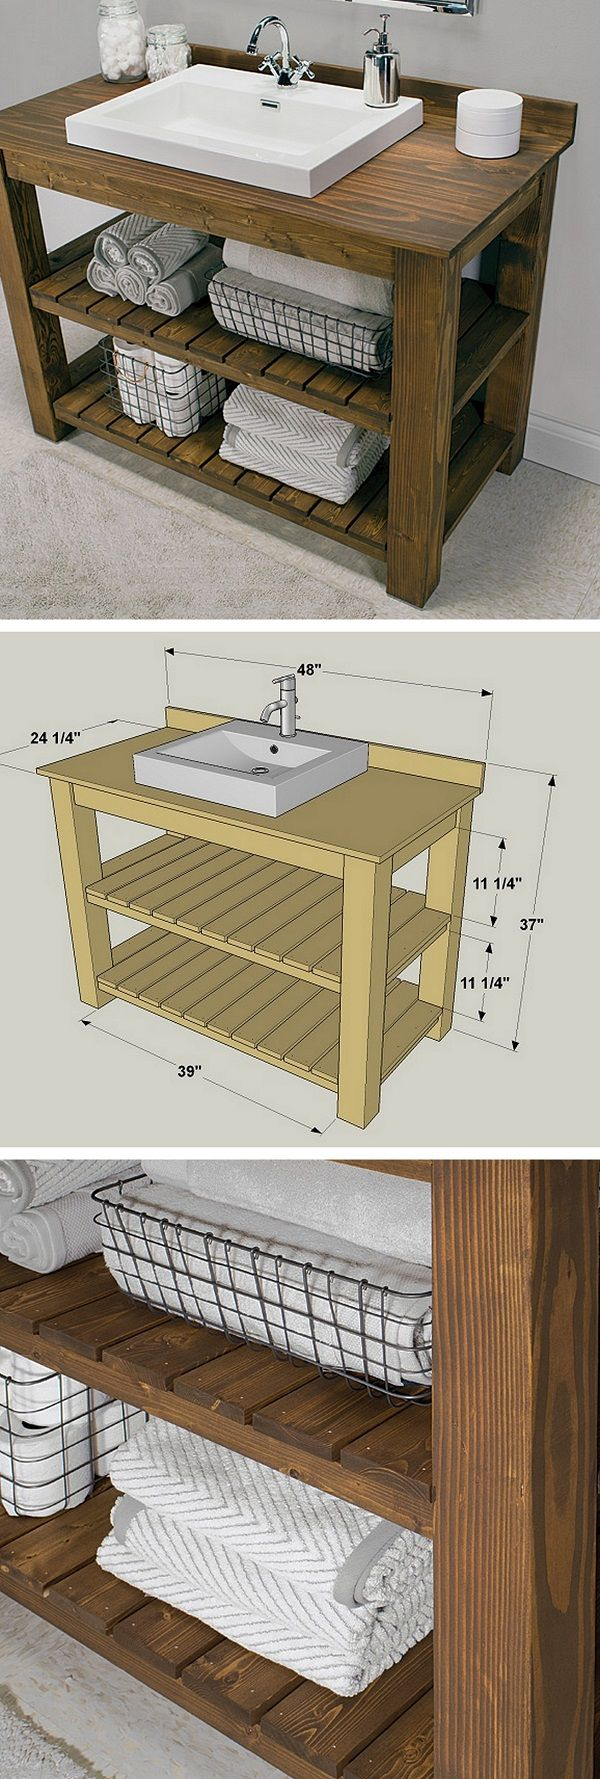 24 Easy DIY Bathroom Vanity Plans for a Quick Remodel